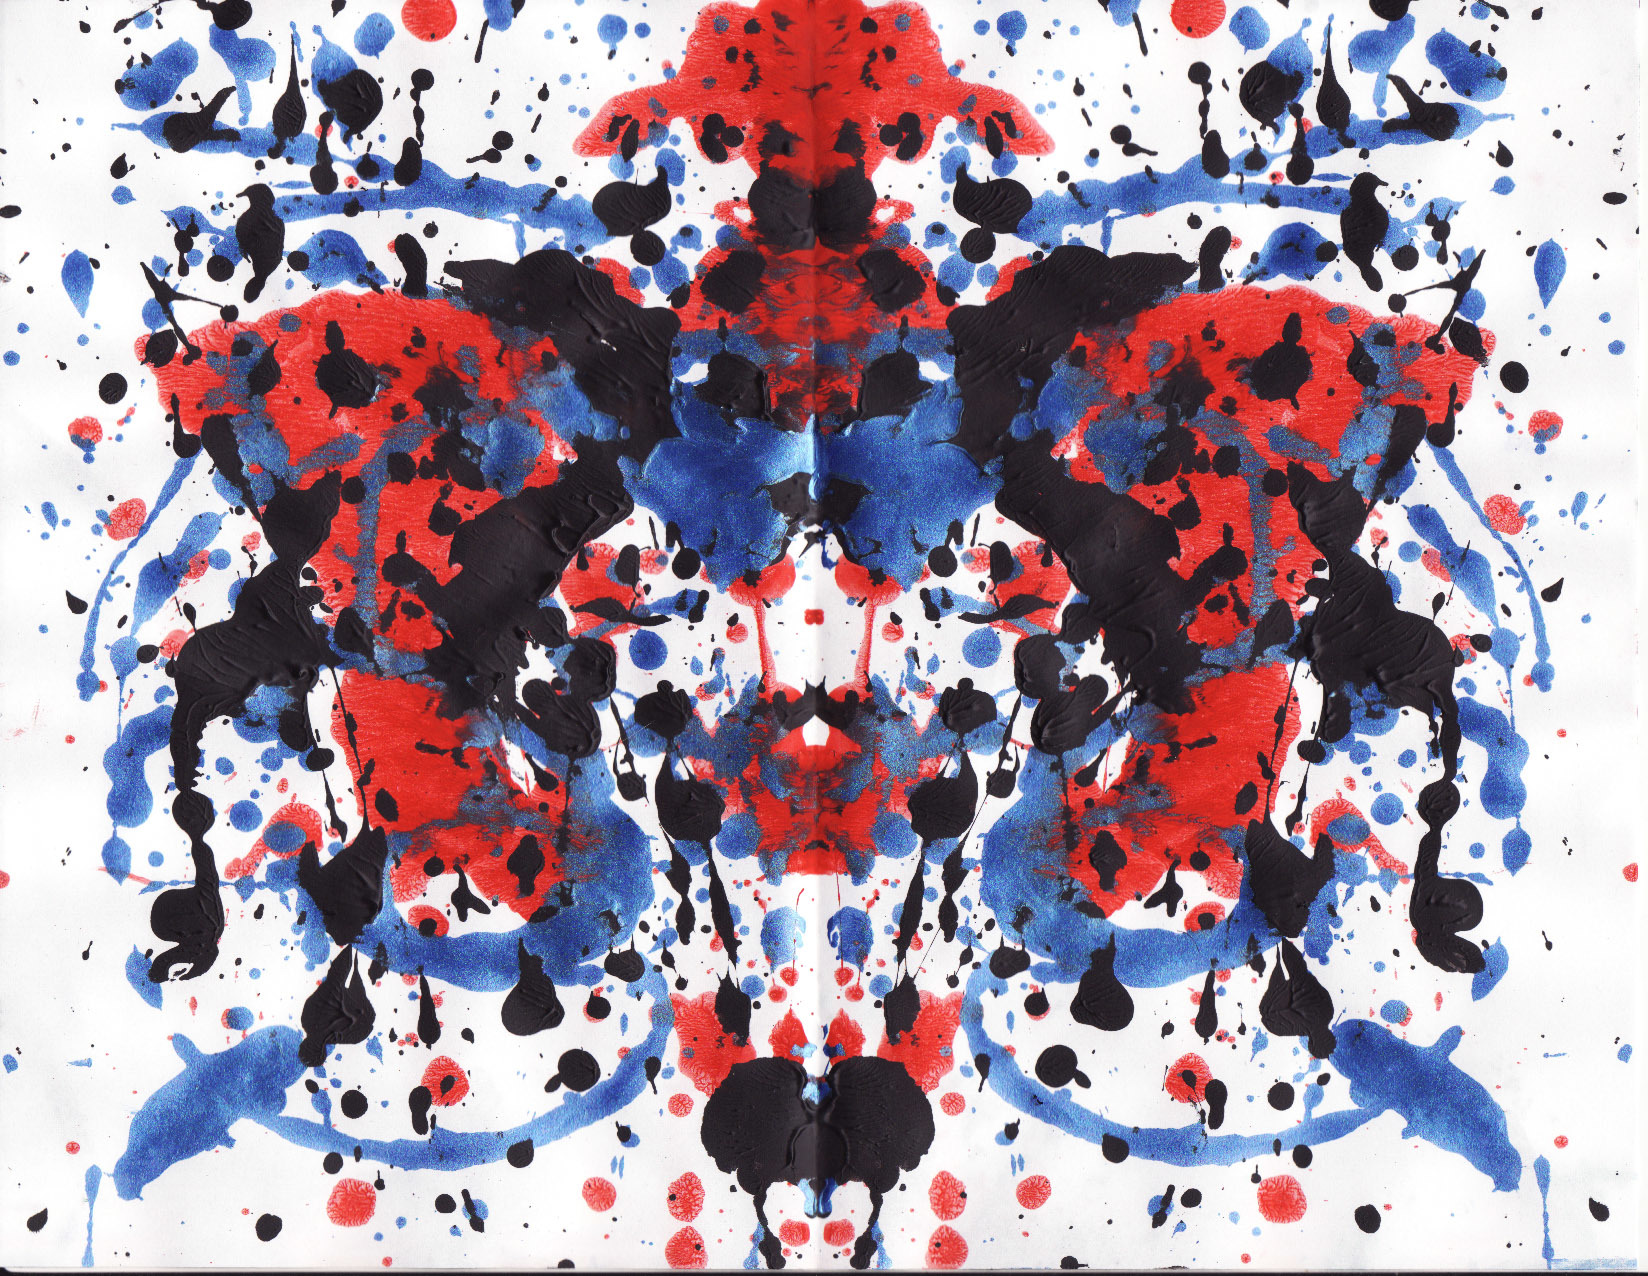 Abstract Ink Blot Rorschach